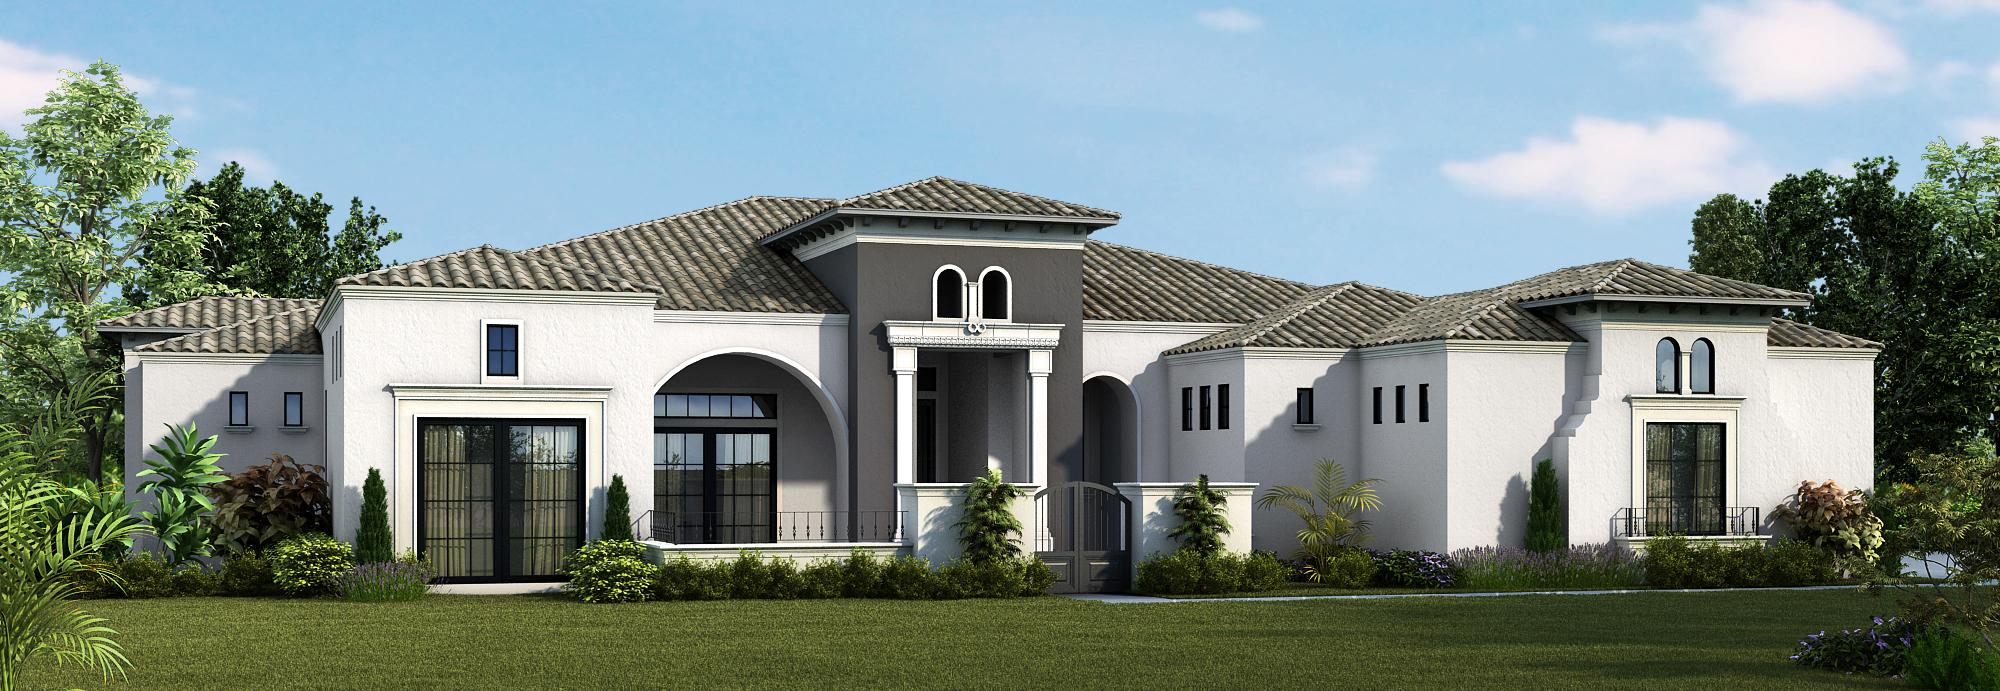 Transitional House Plans Ideas  House Plans  50695